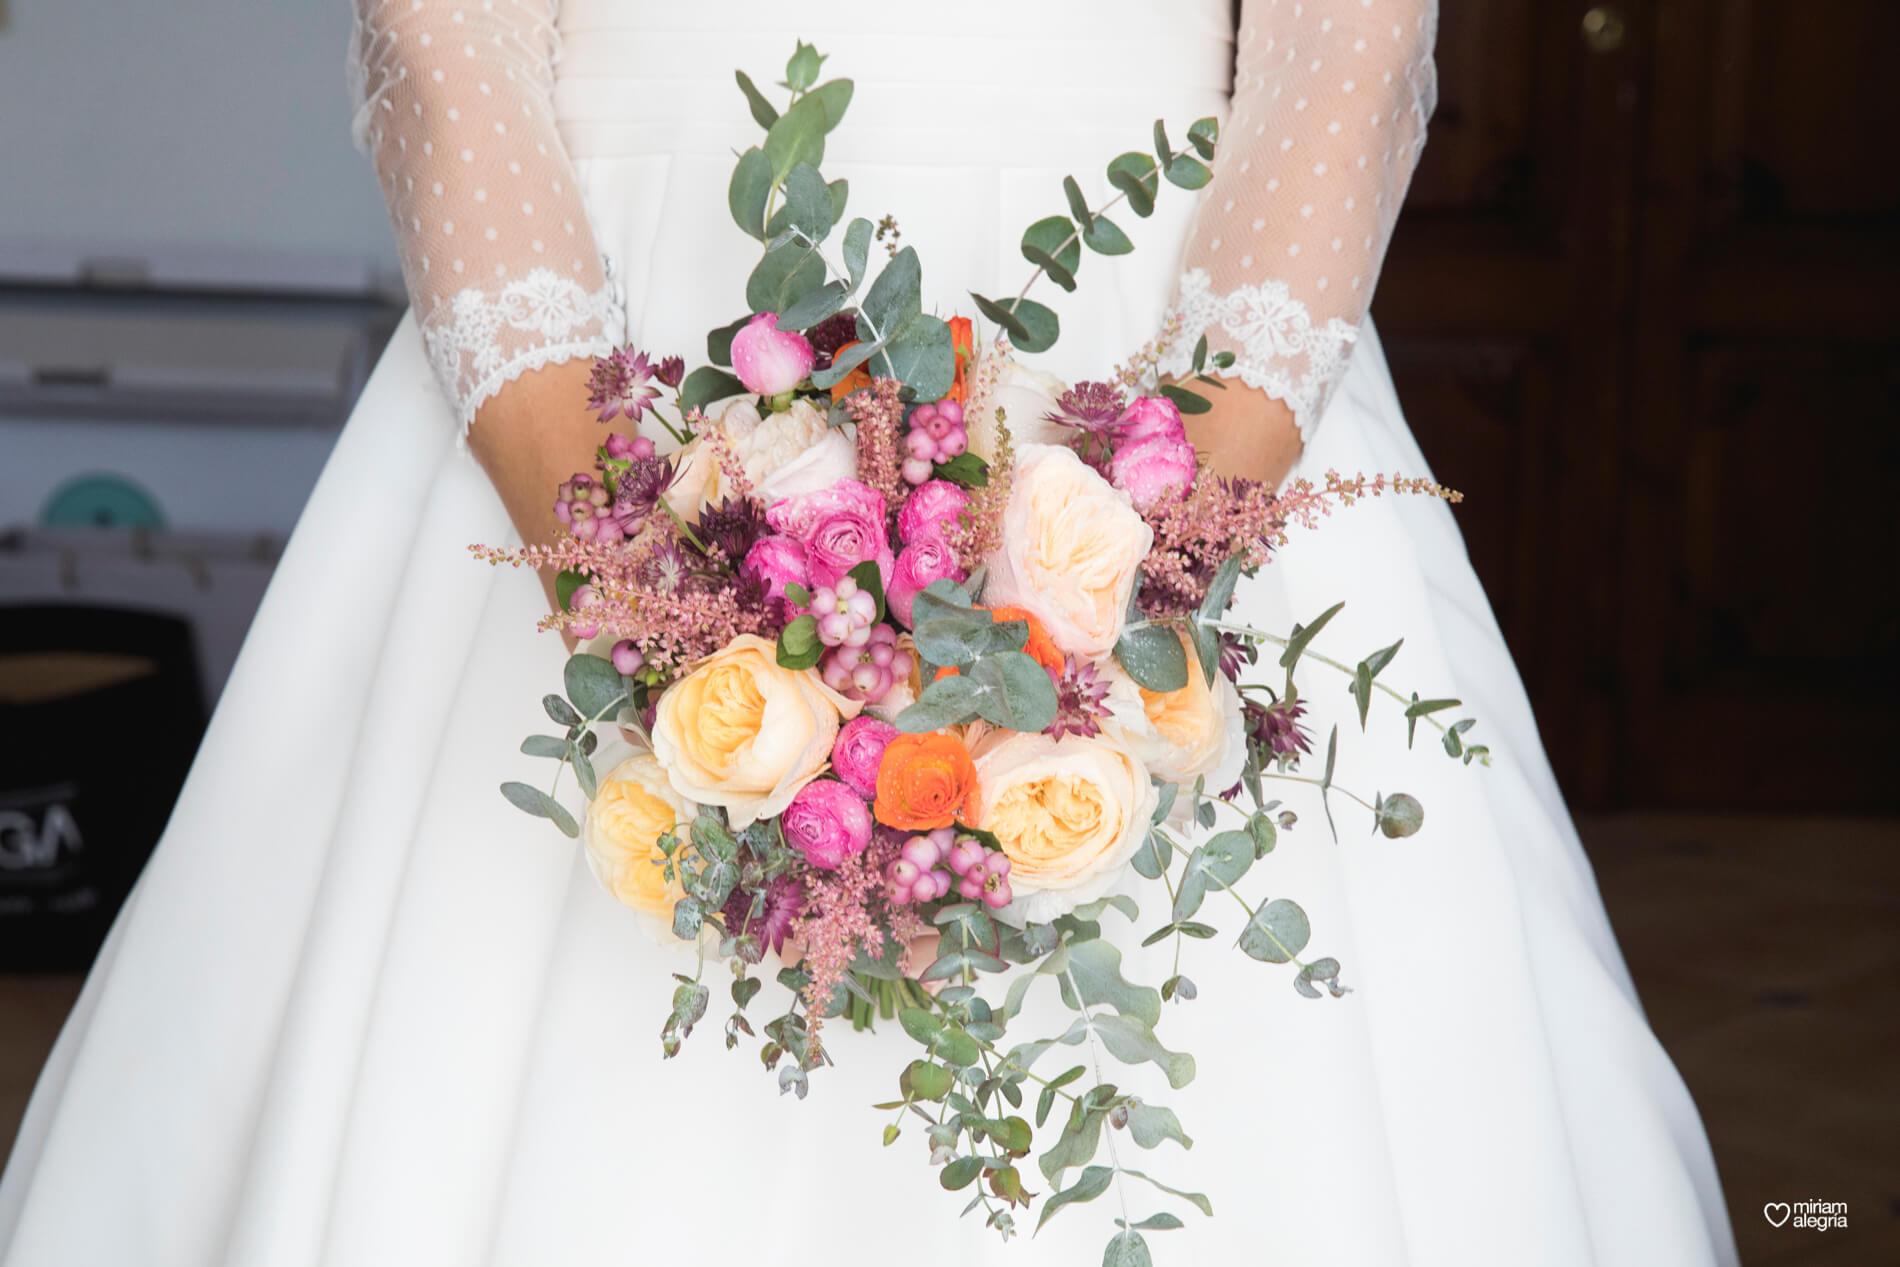 la-boda-de-alemc7-miriam-alegria-fotografos-boda-murcia-31